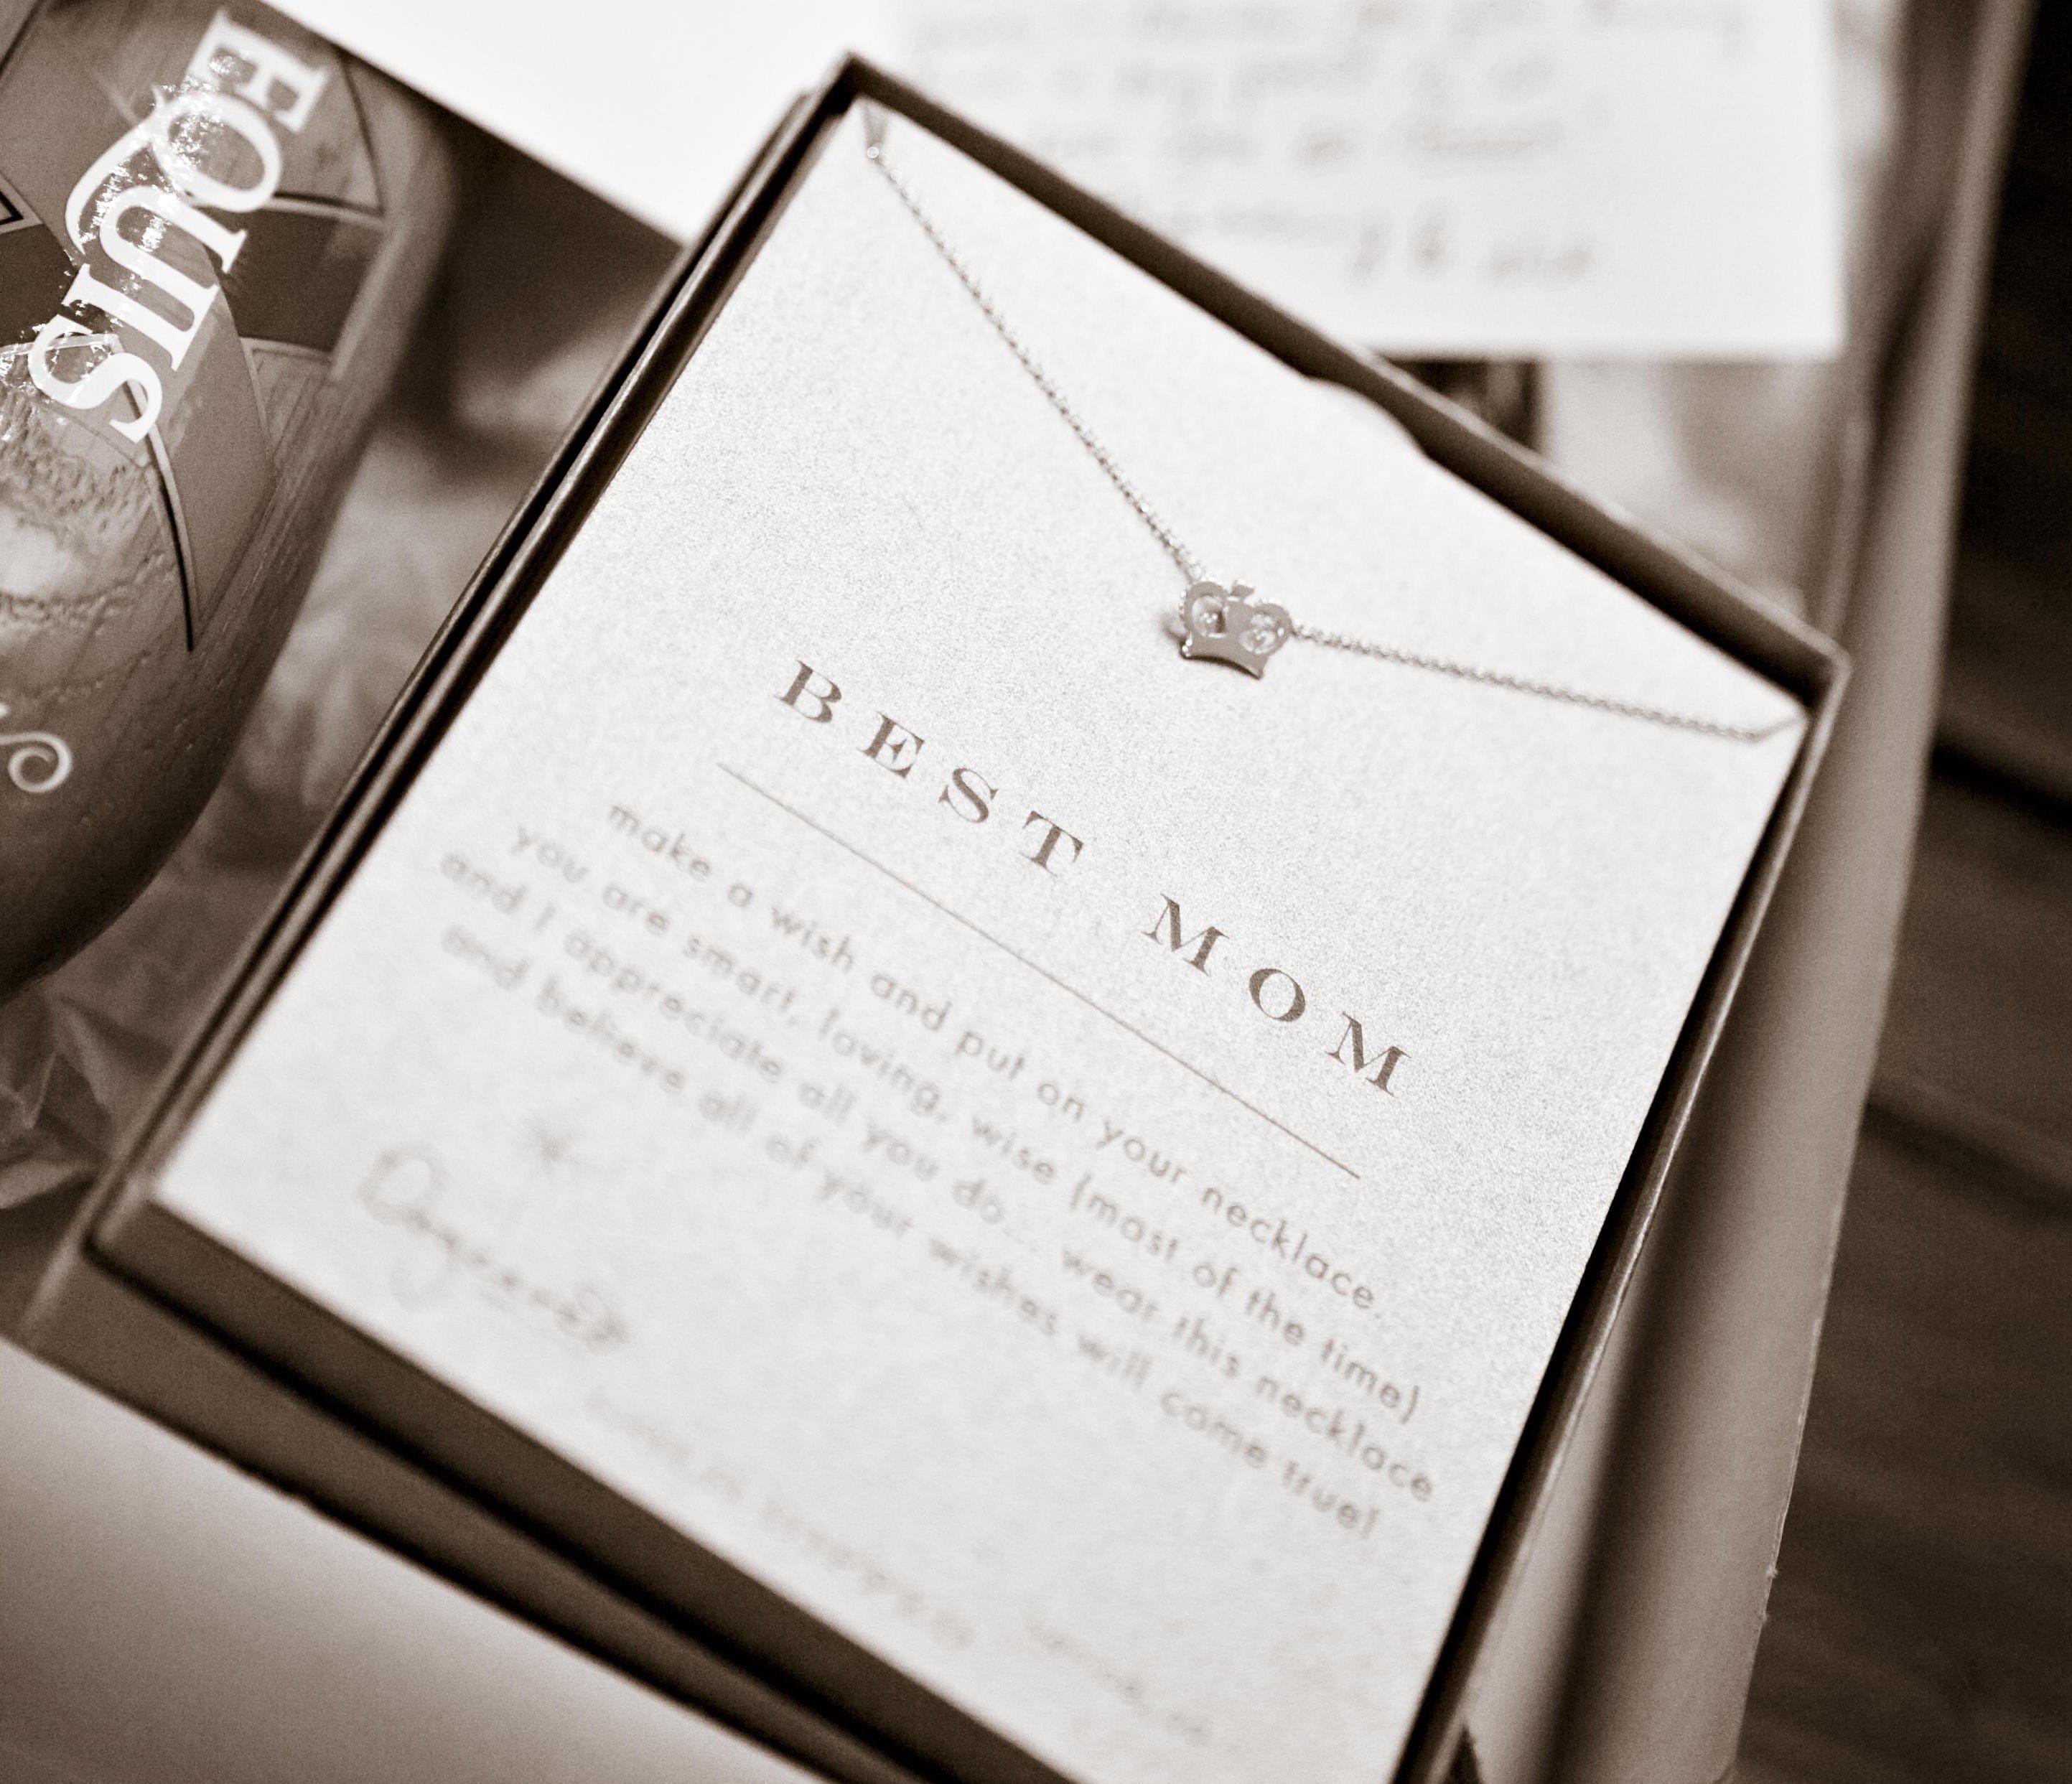 10 Pretty Wedding Gift Ideas From Parents idea wedding wedding gift ideas for mom small family wedding ideas 2020